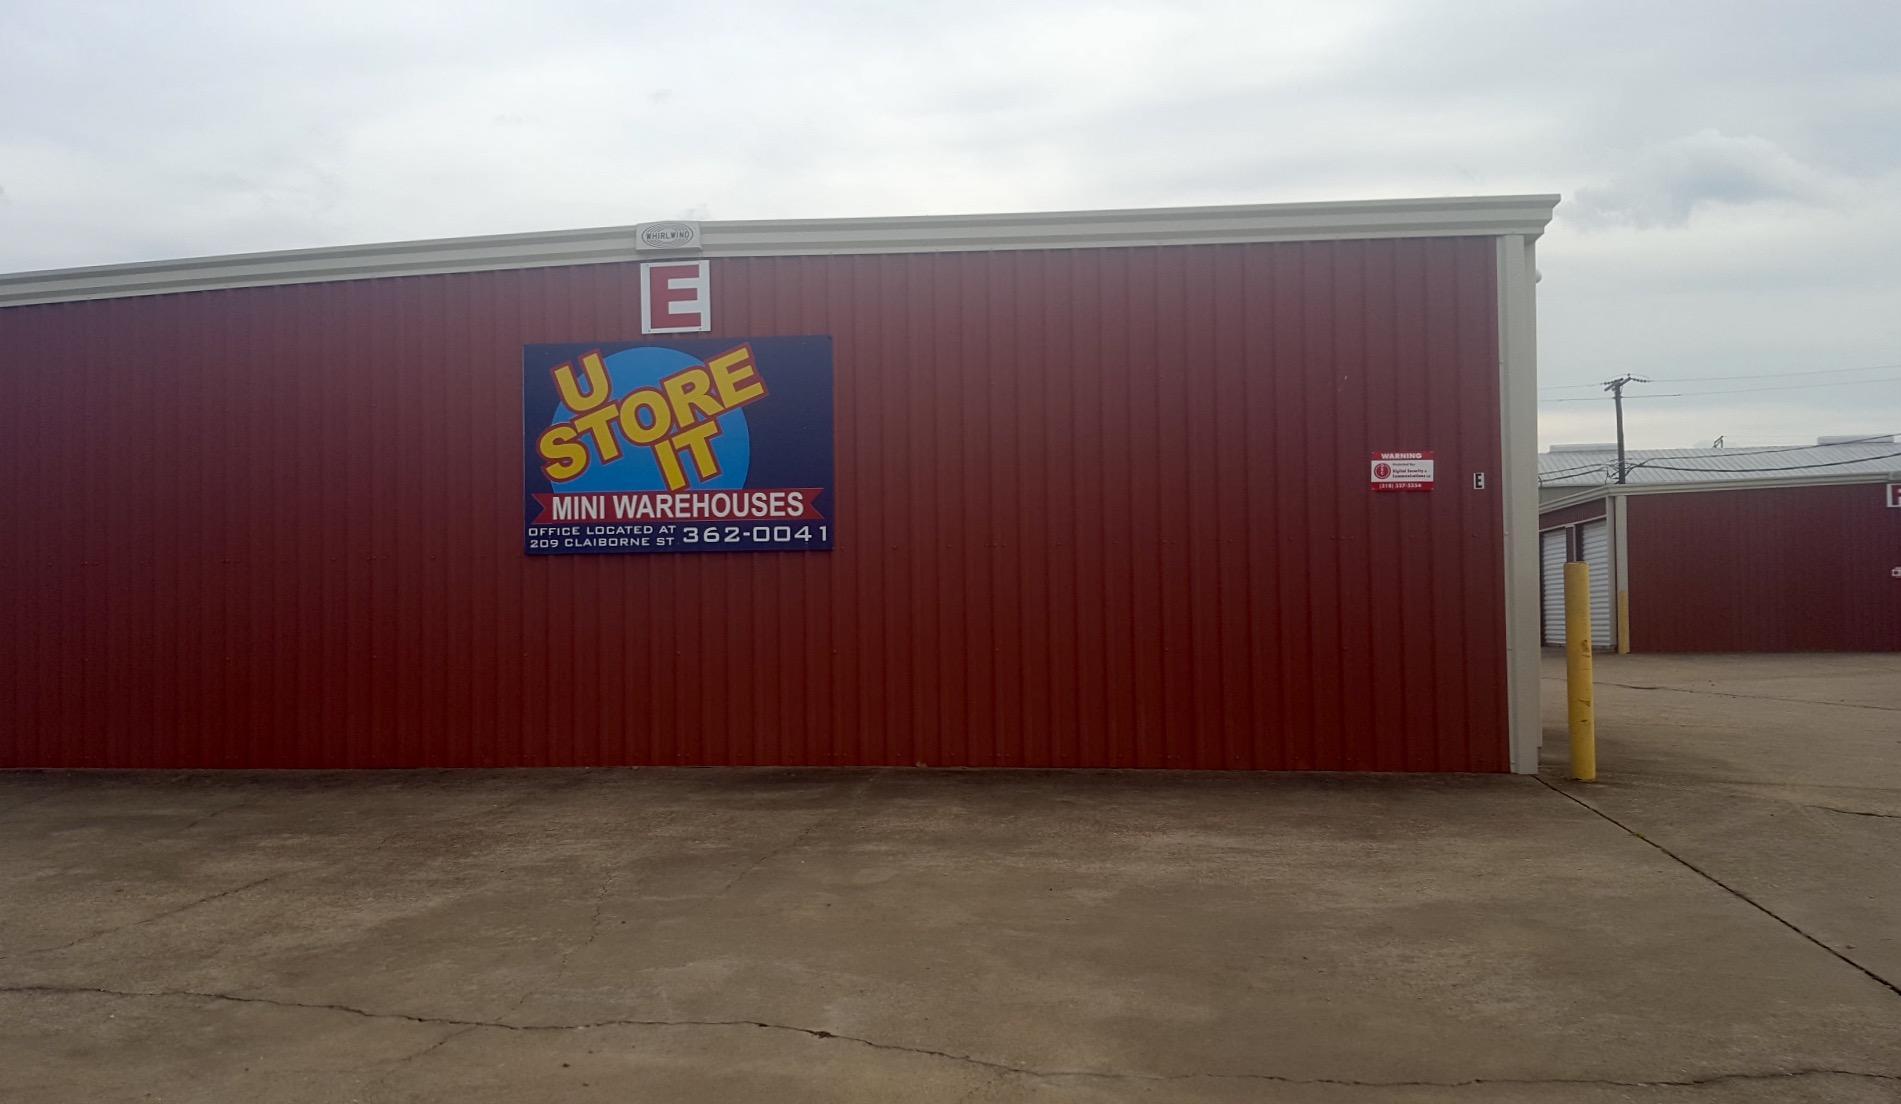 U-Store-It Warehouses image 1